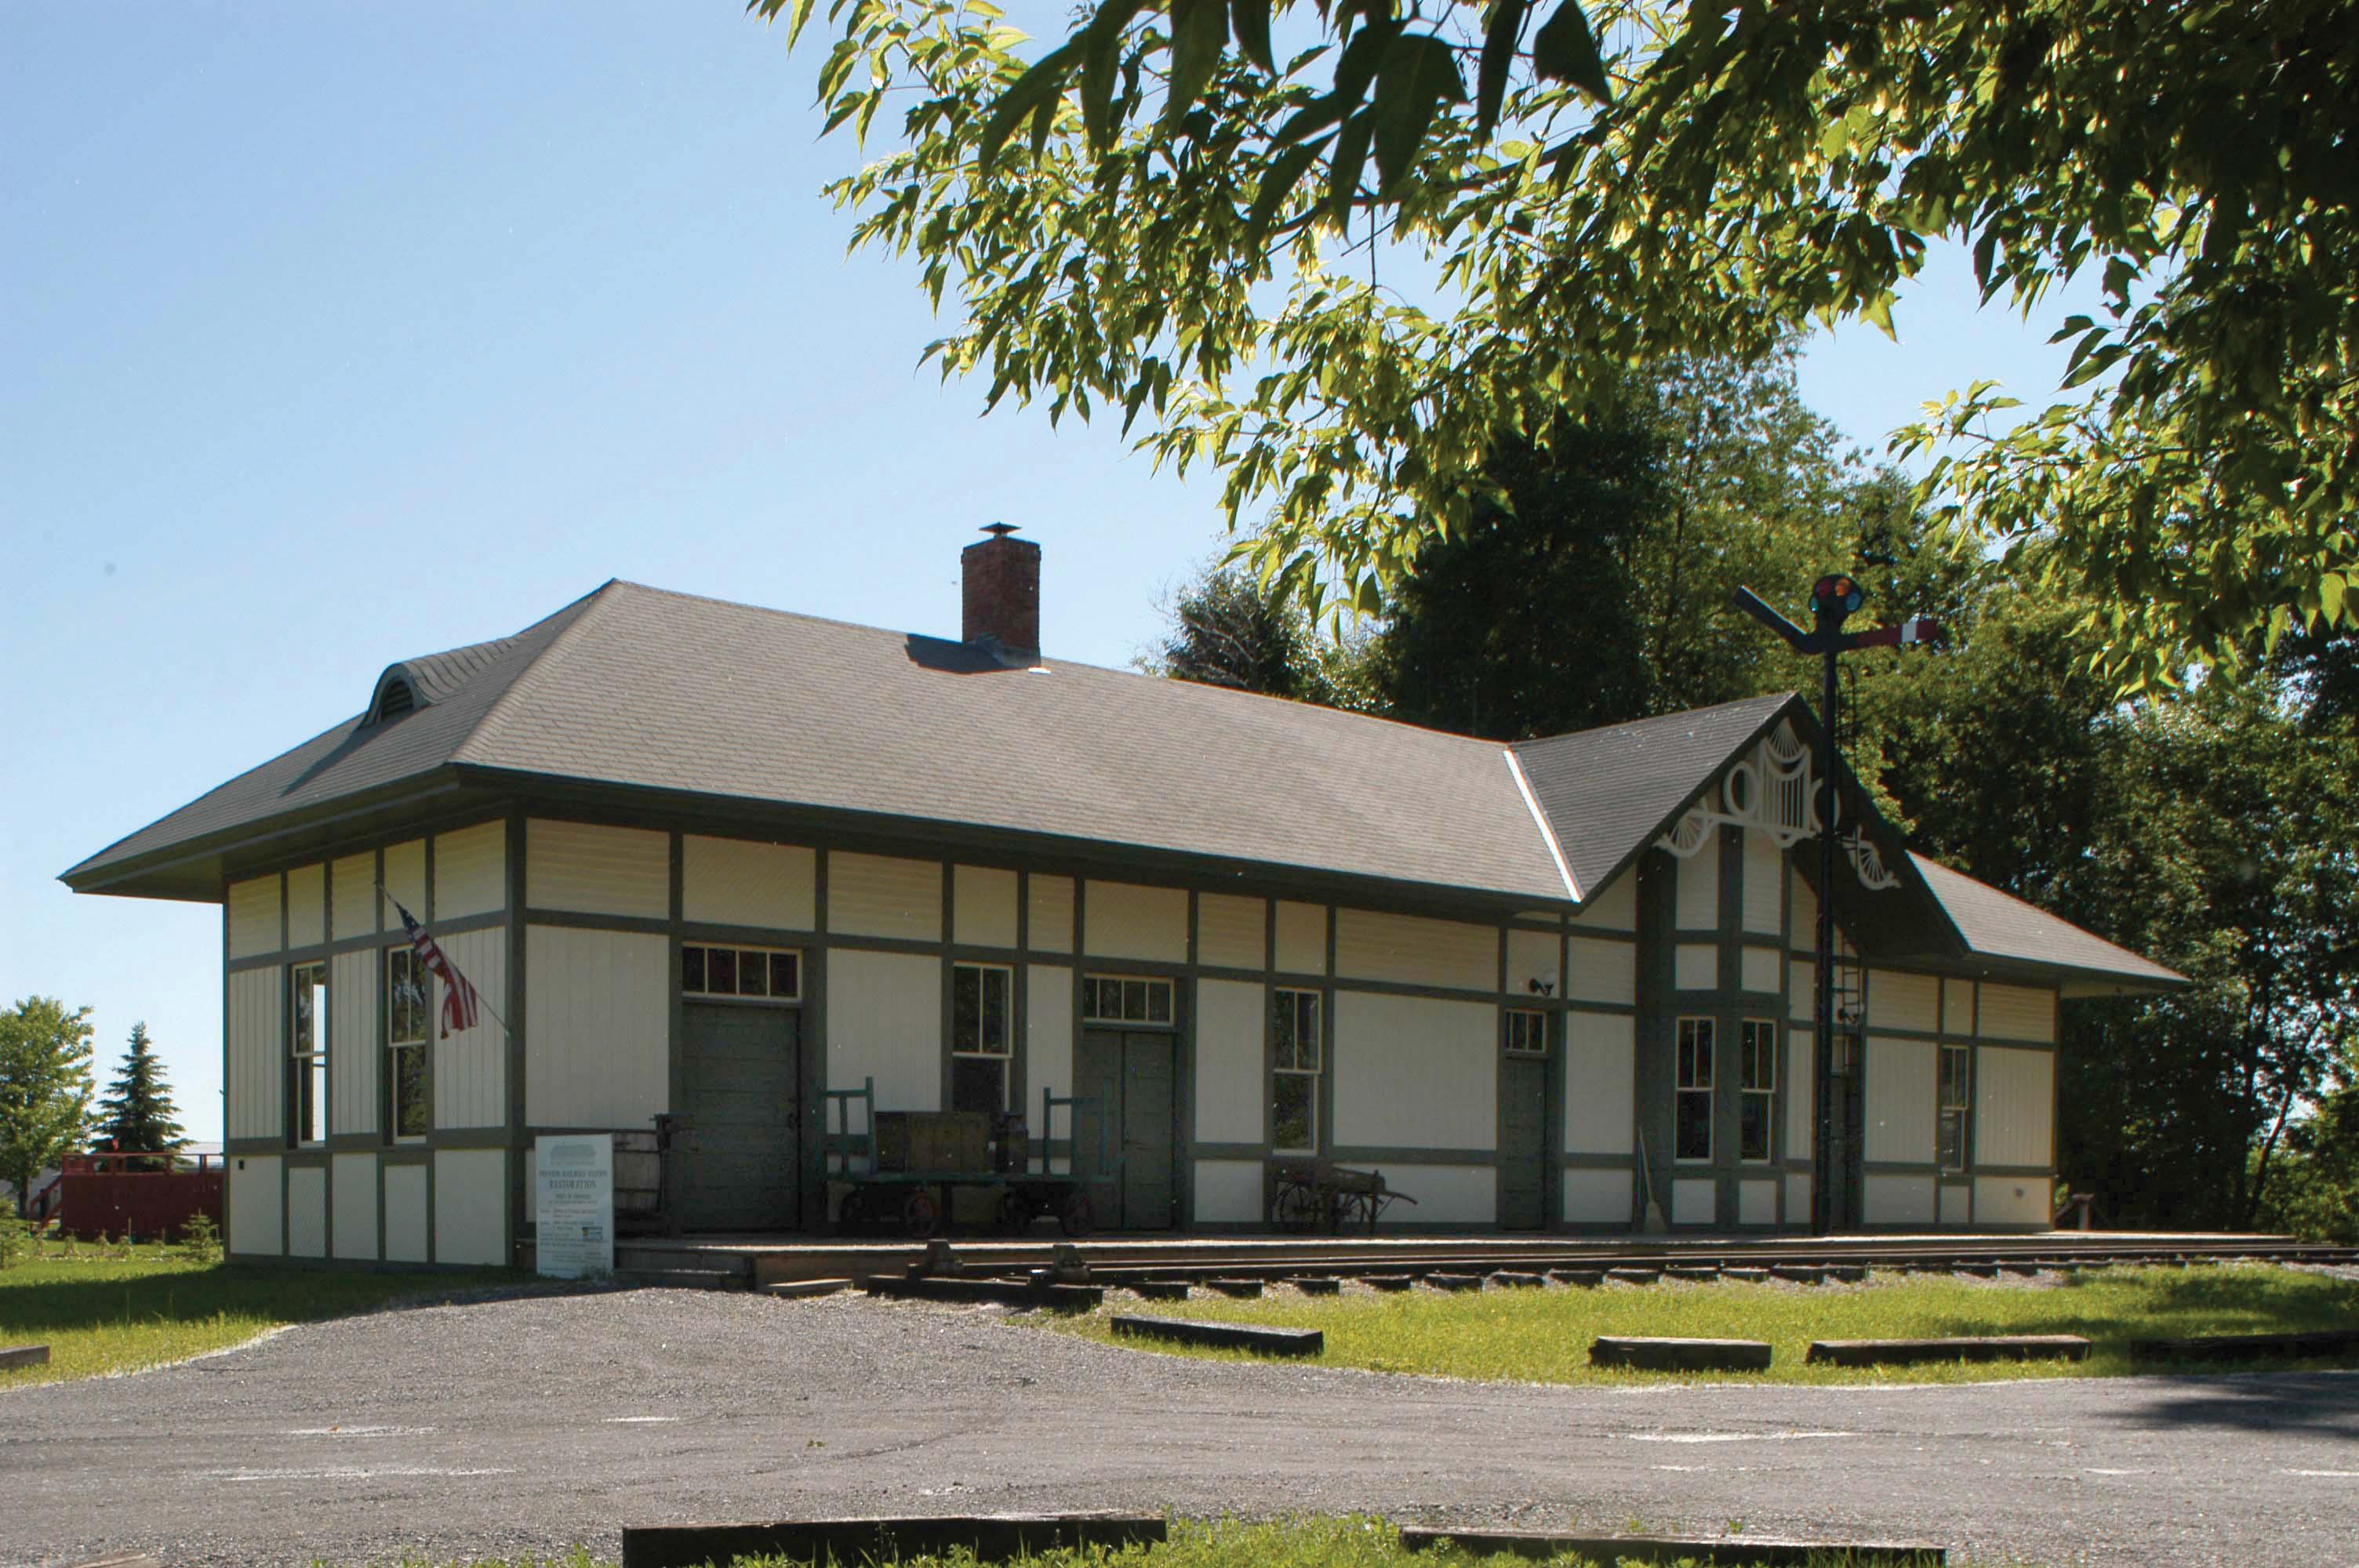 Swanton Railroad Depot